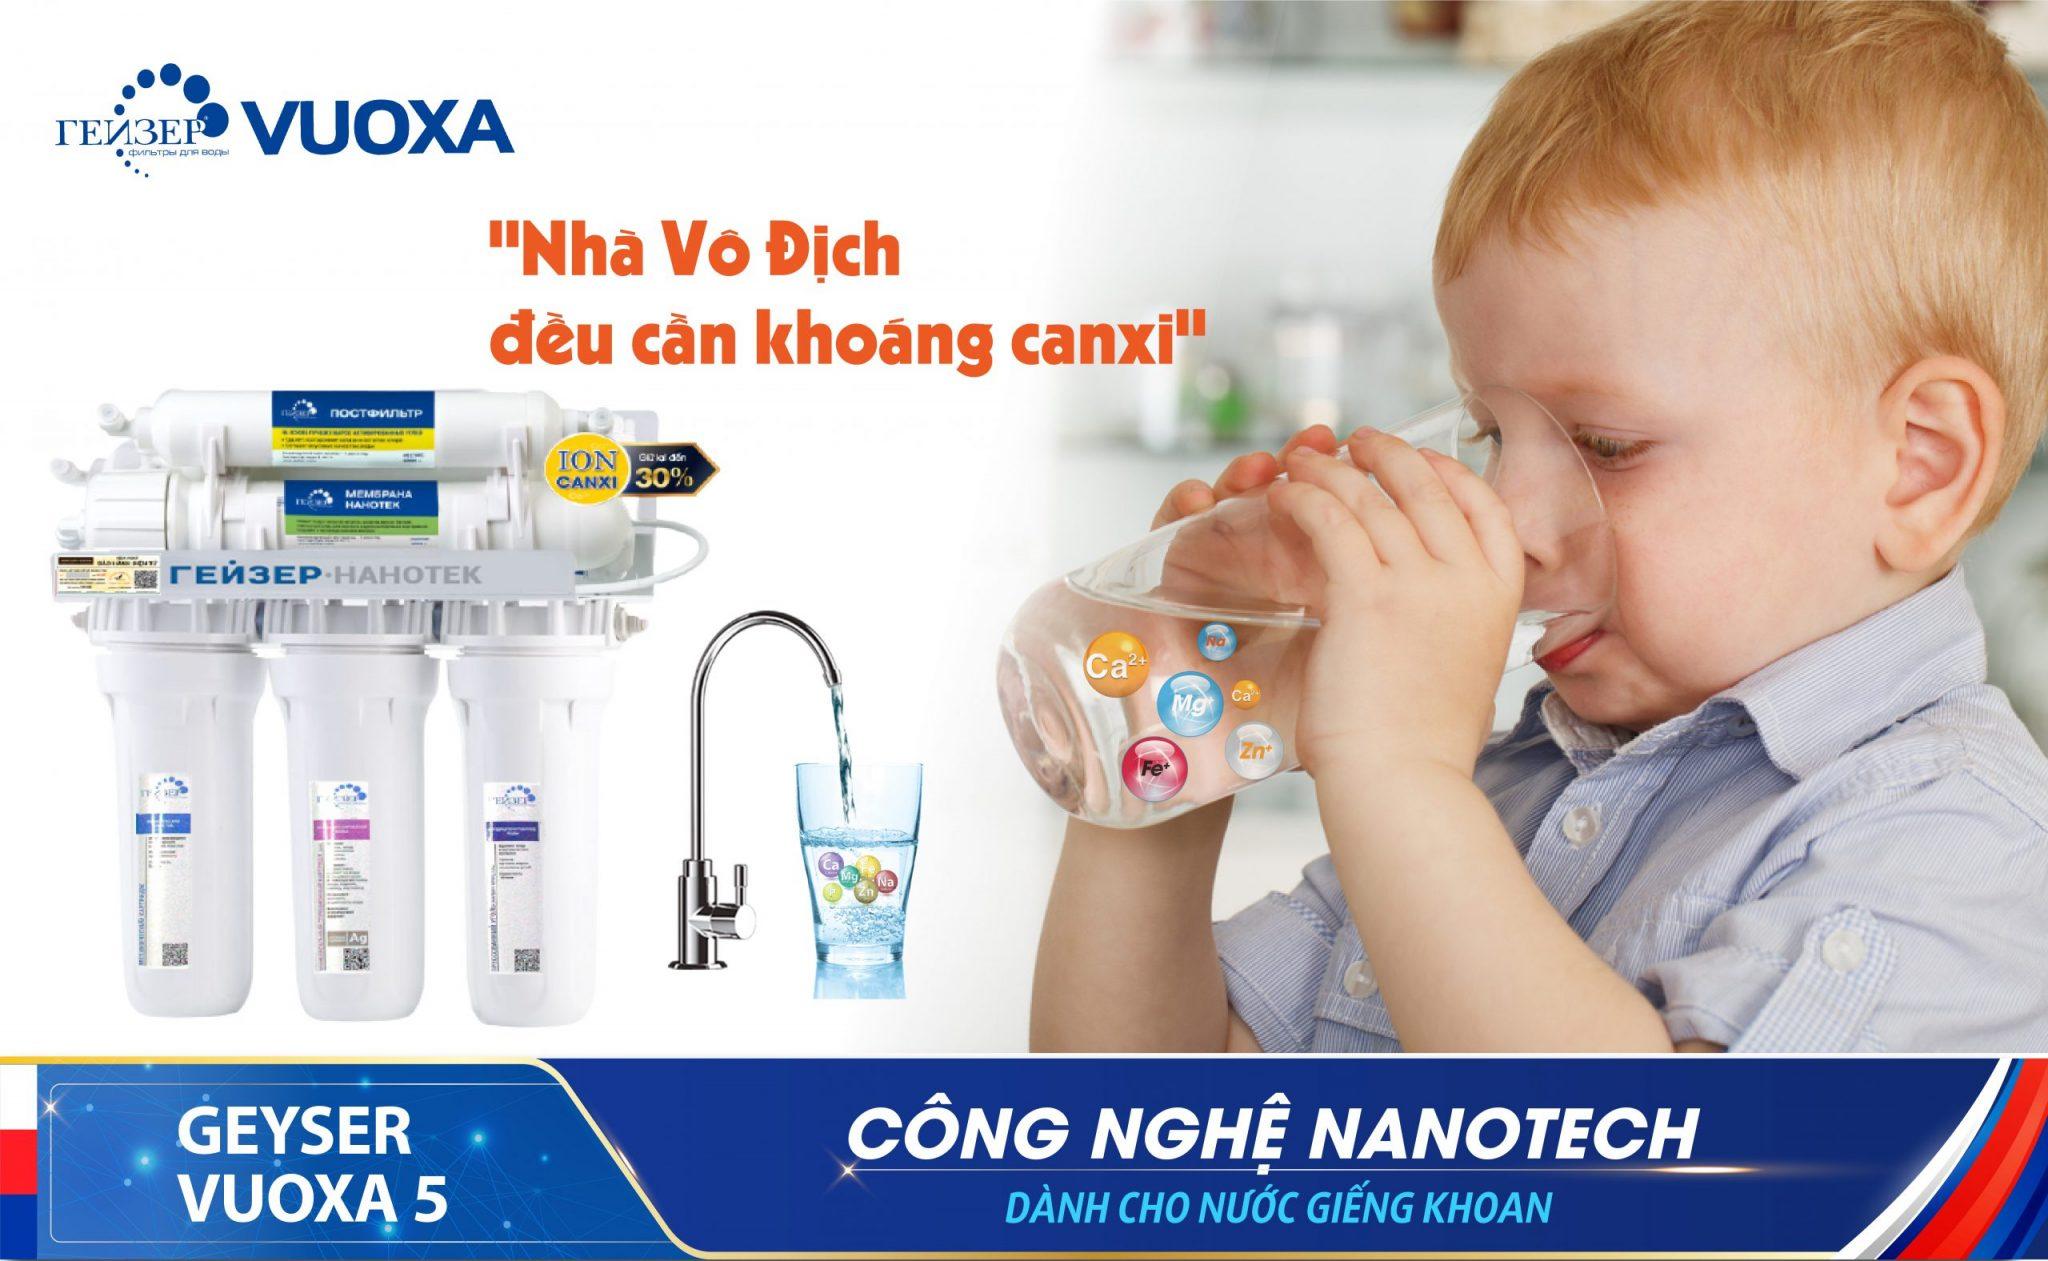 Geyser Vuoxa 5 lọc nước giàu canxi